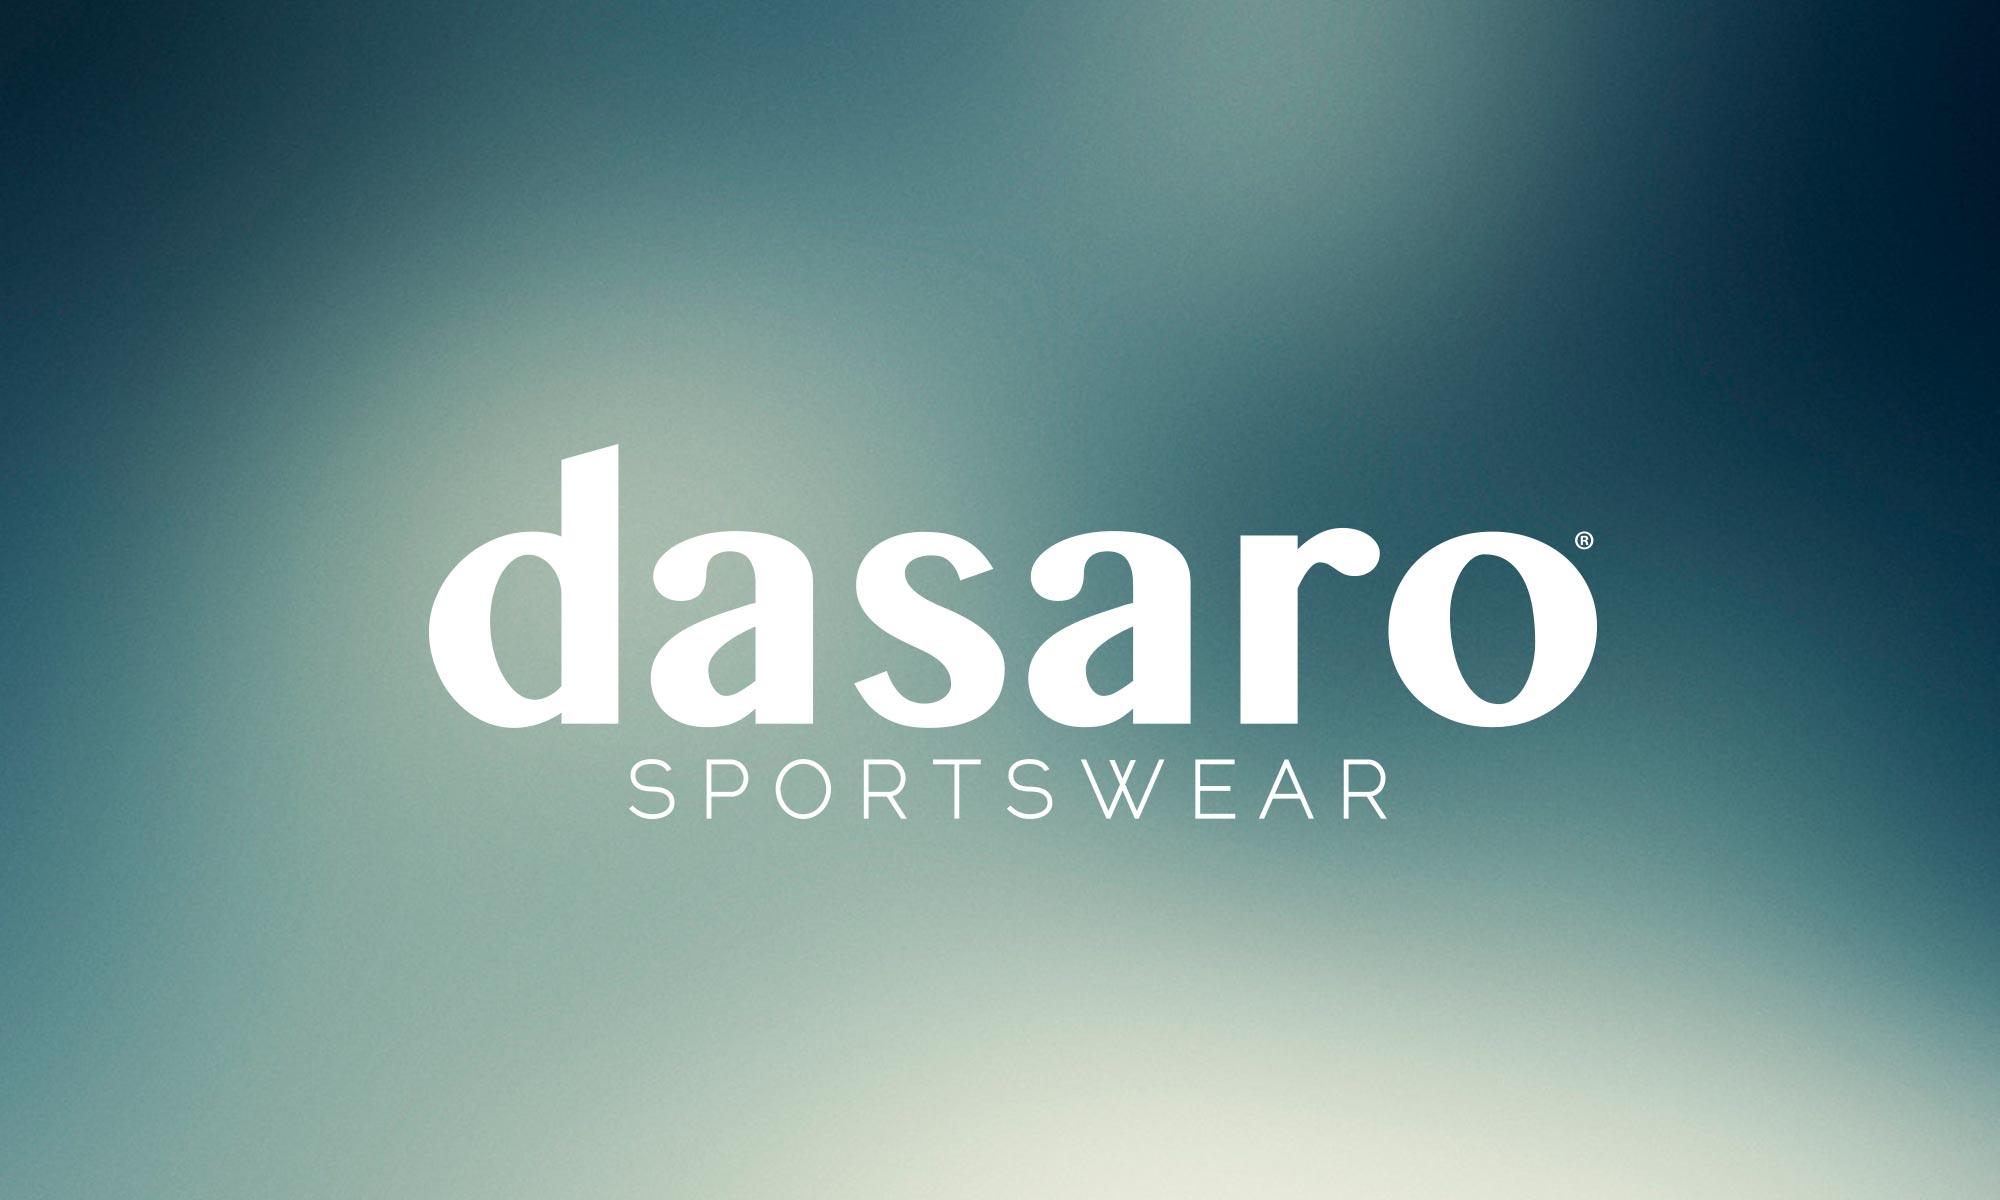 https://www.atelierzoz.com/wp-content/uploads/2020/03/works_dasaro-1.jpg